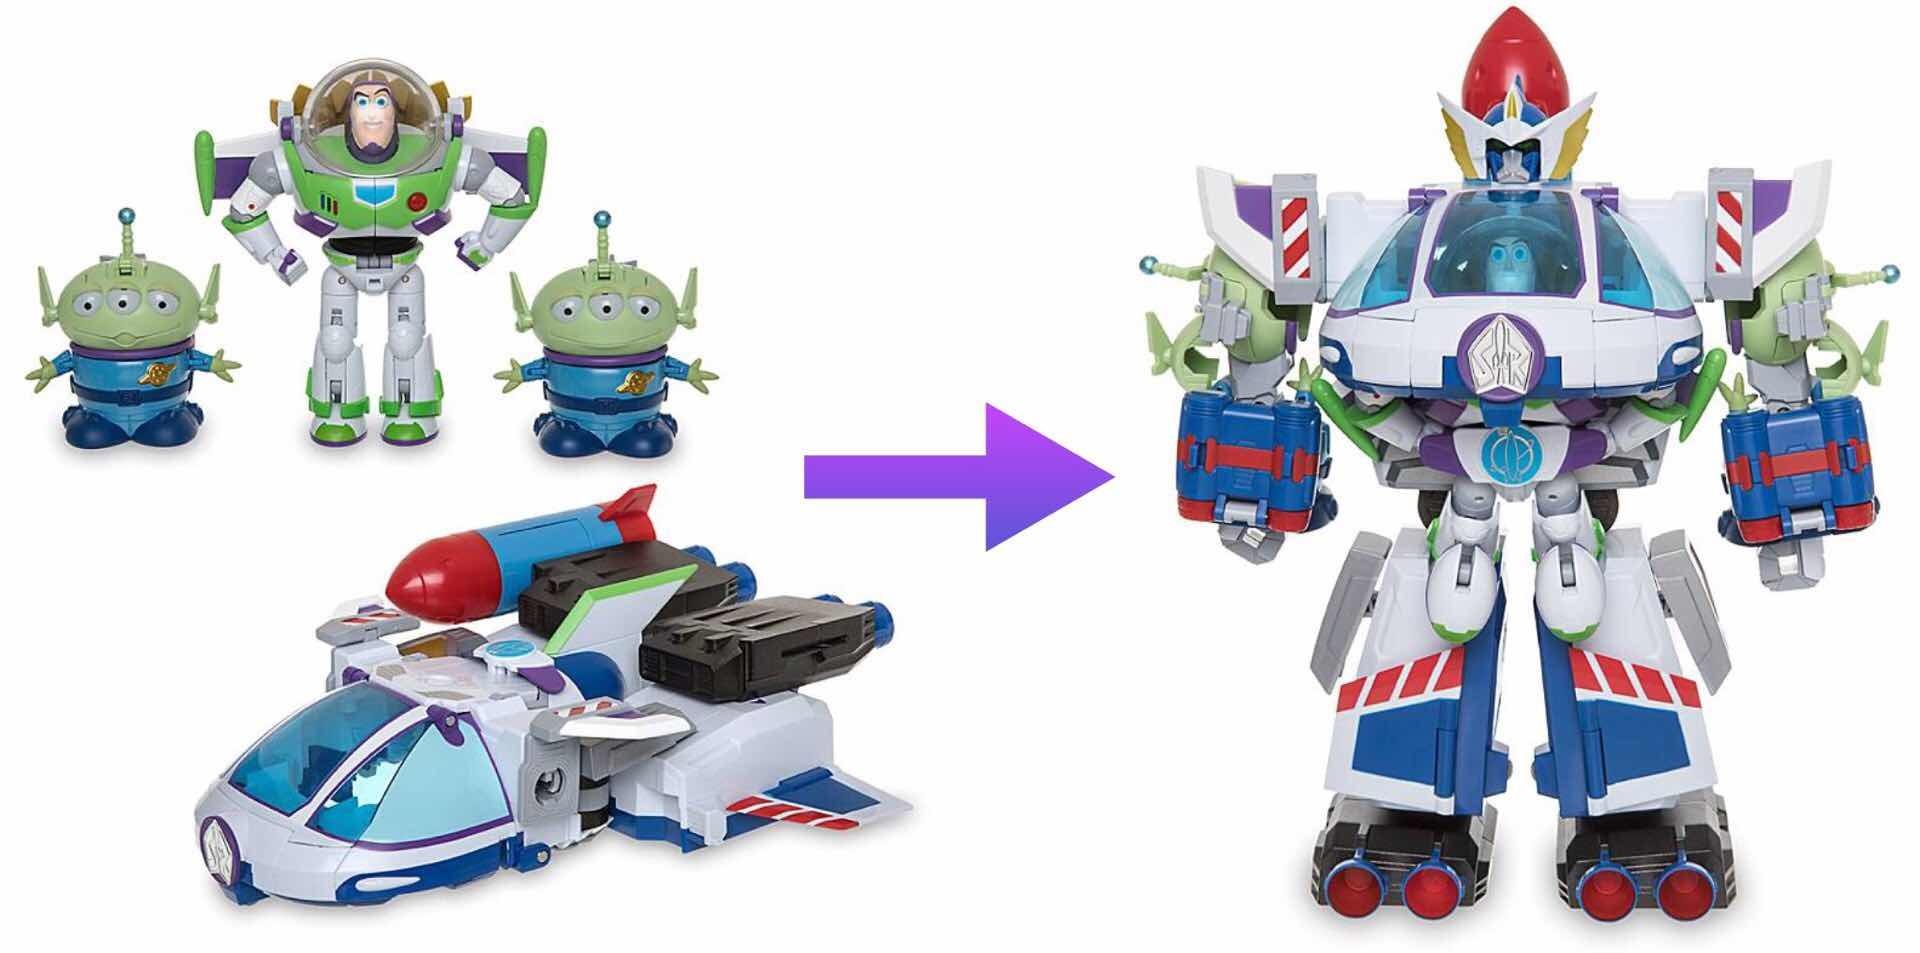 disney-bandai-toy-story-chogokin-mecha-toys-buzz-lightyear-space-ranger-robo